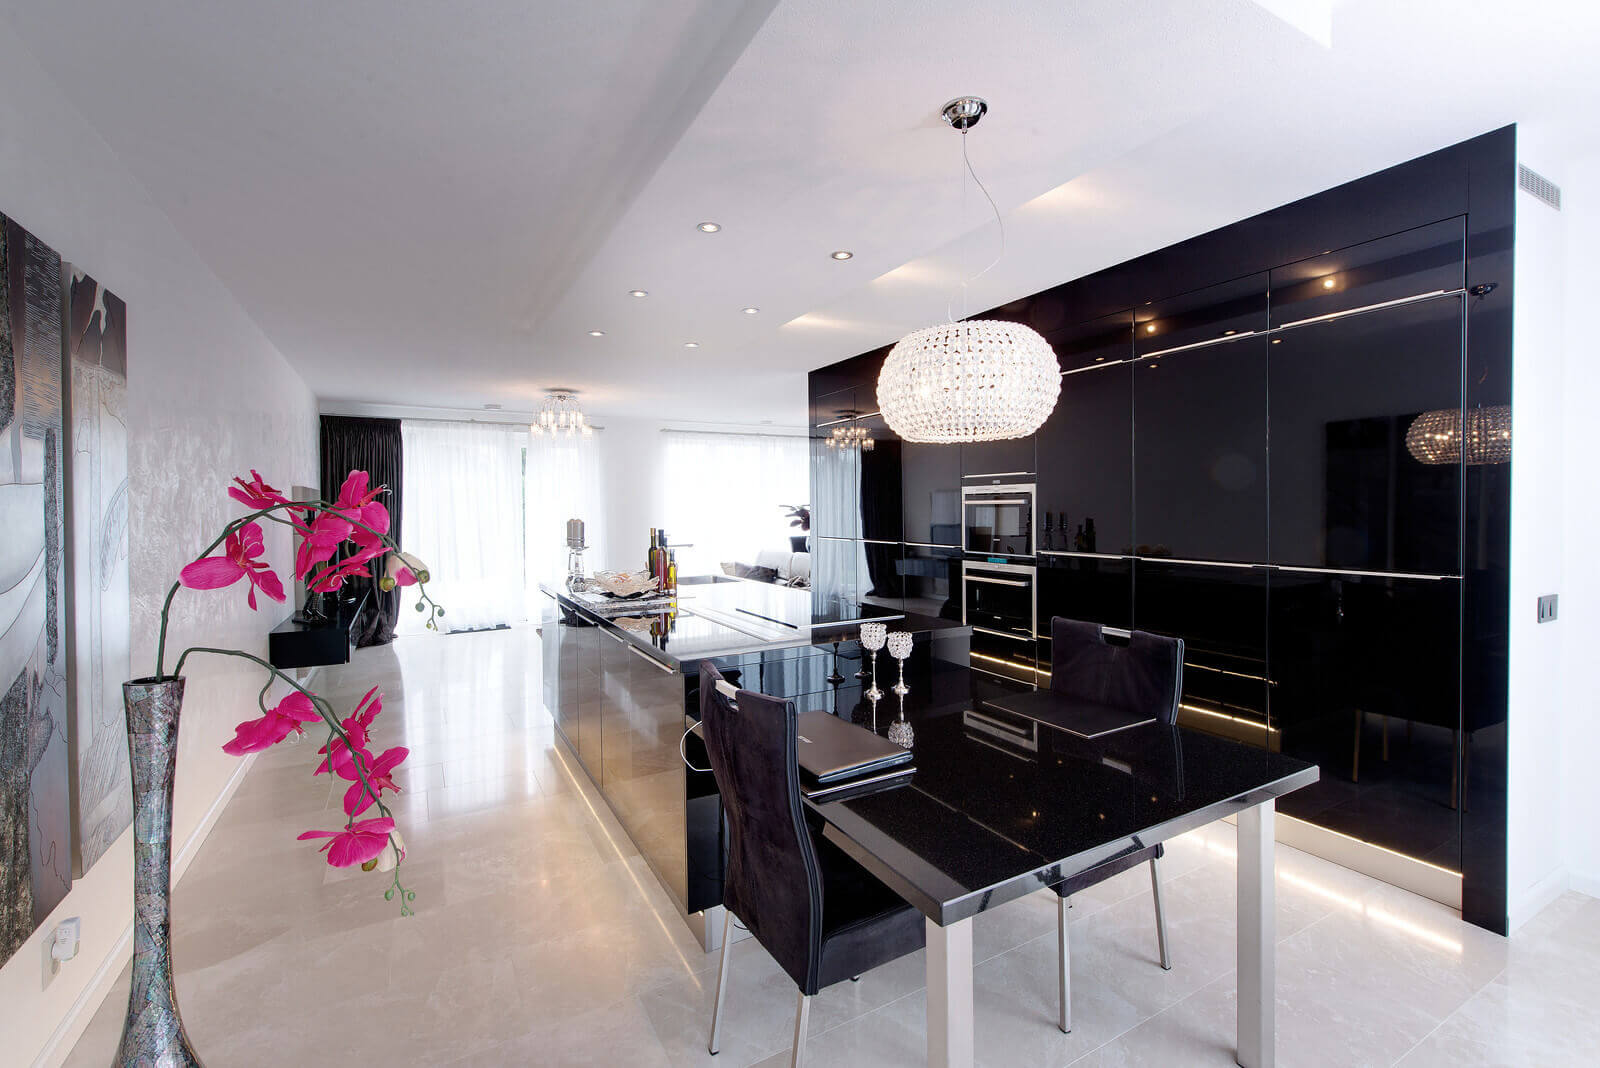 Glanzende keukens